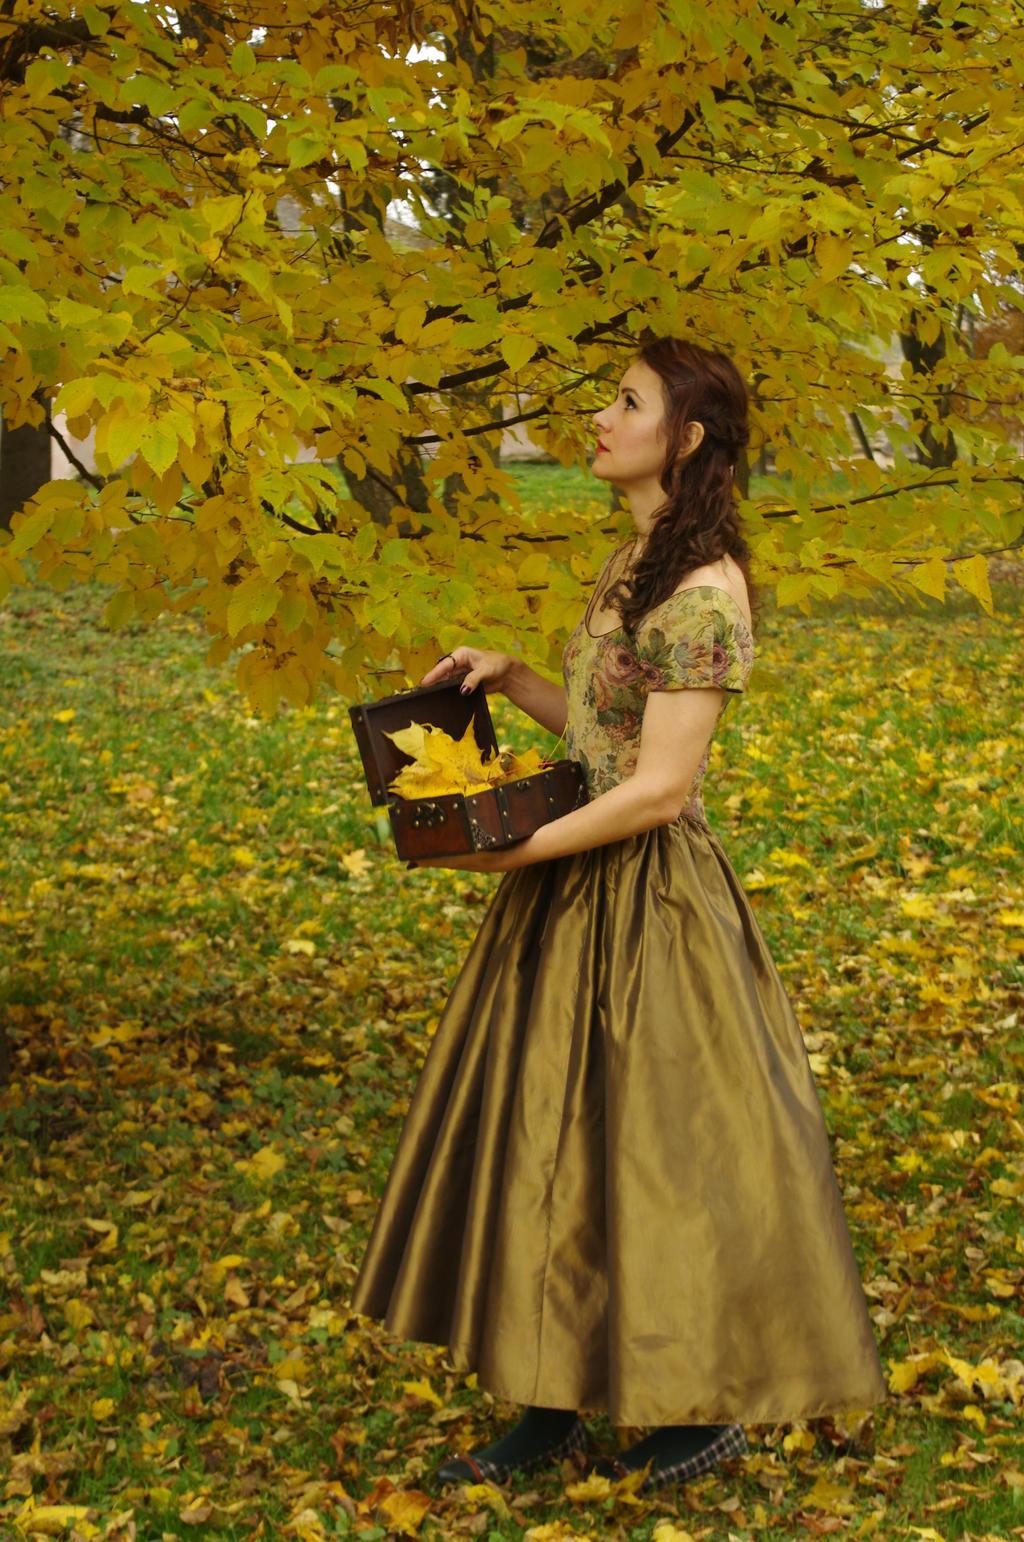 Autumn 07 by Anna-LovelyMonster